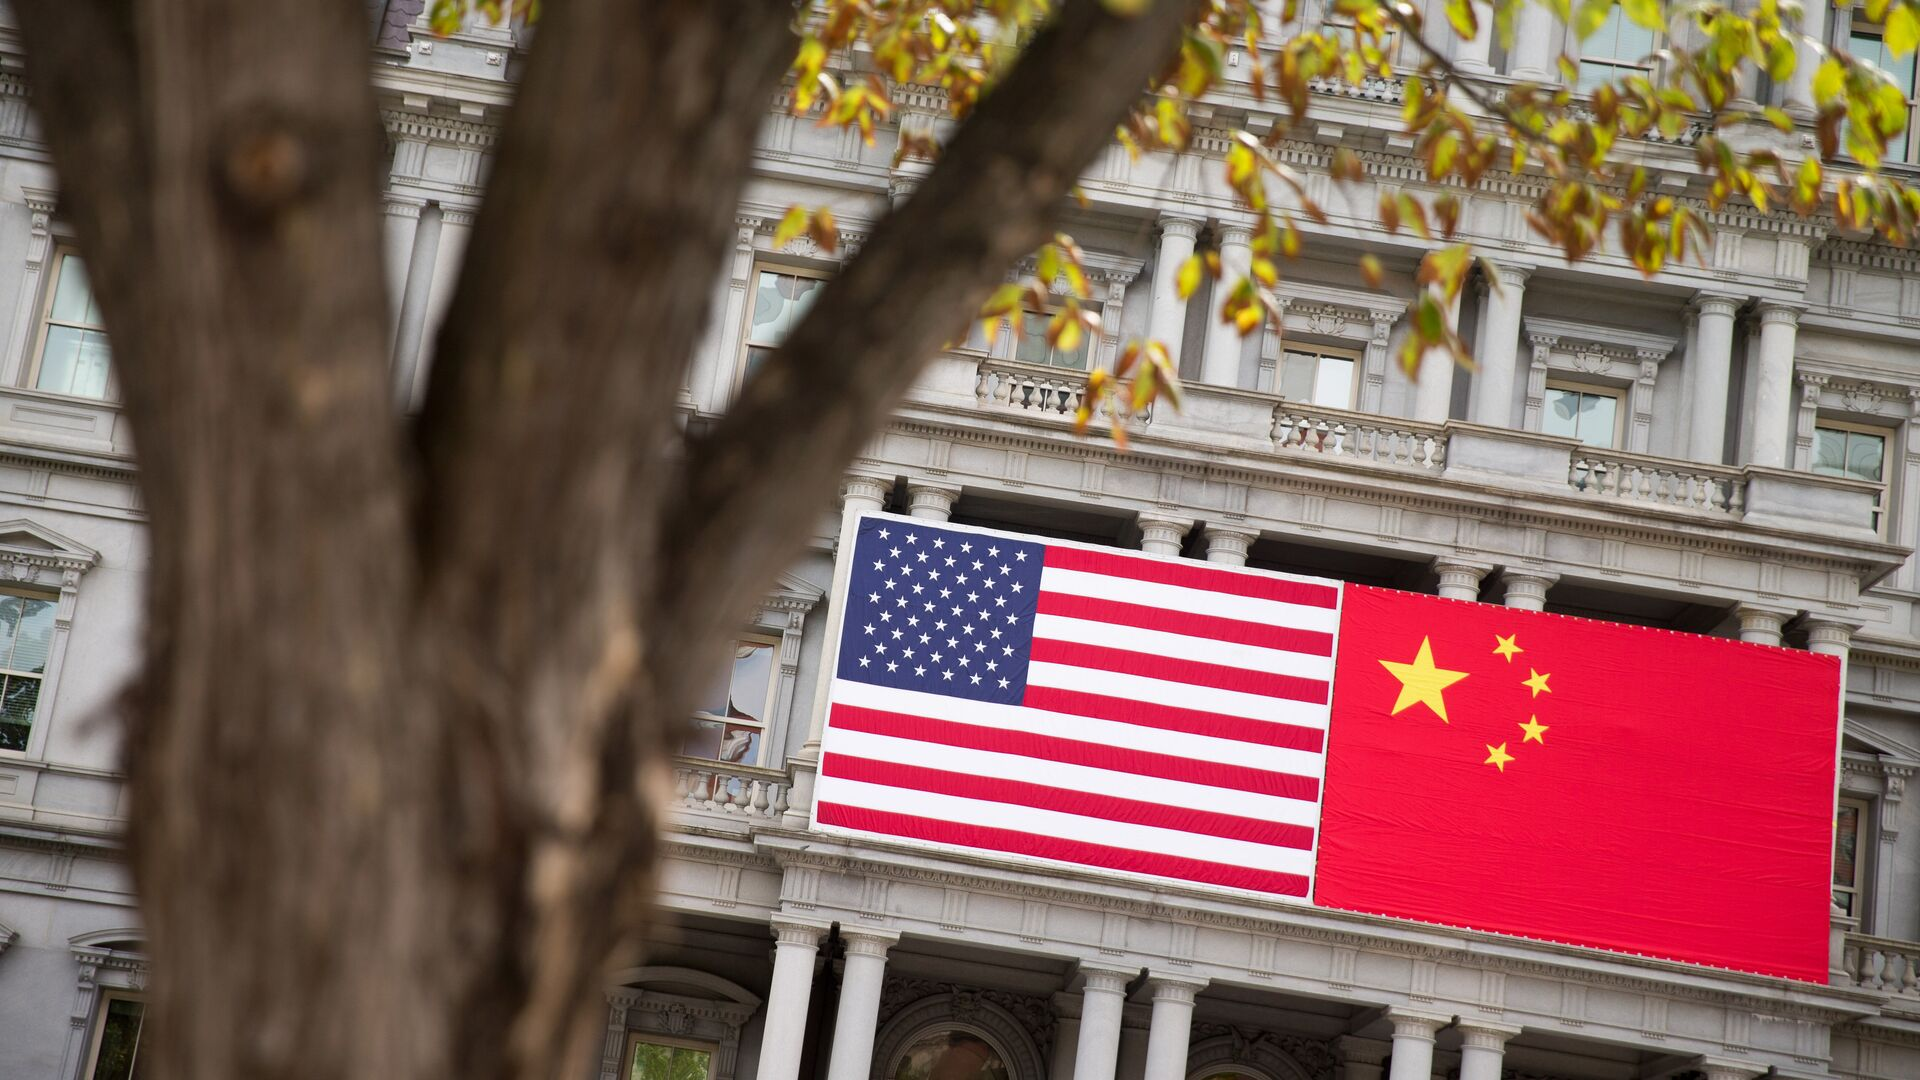 Флаги США и Китая - РИА Новости, 1920, 20.09.2020